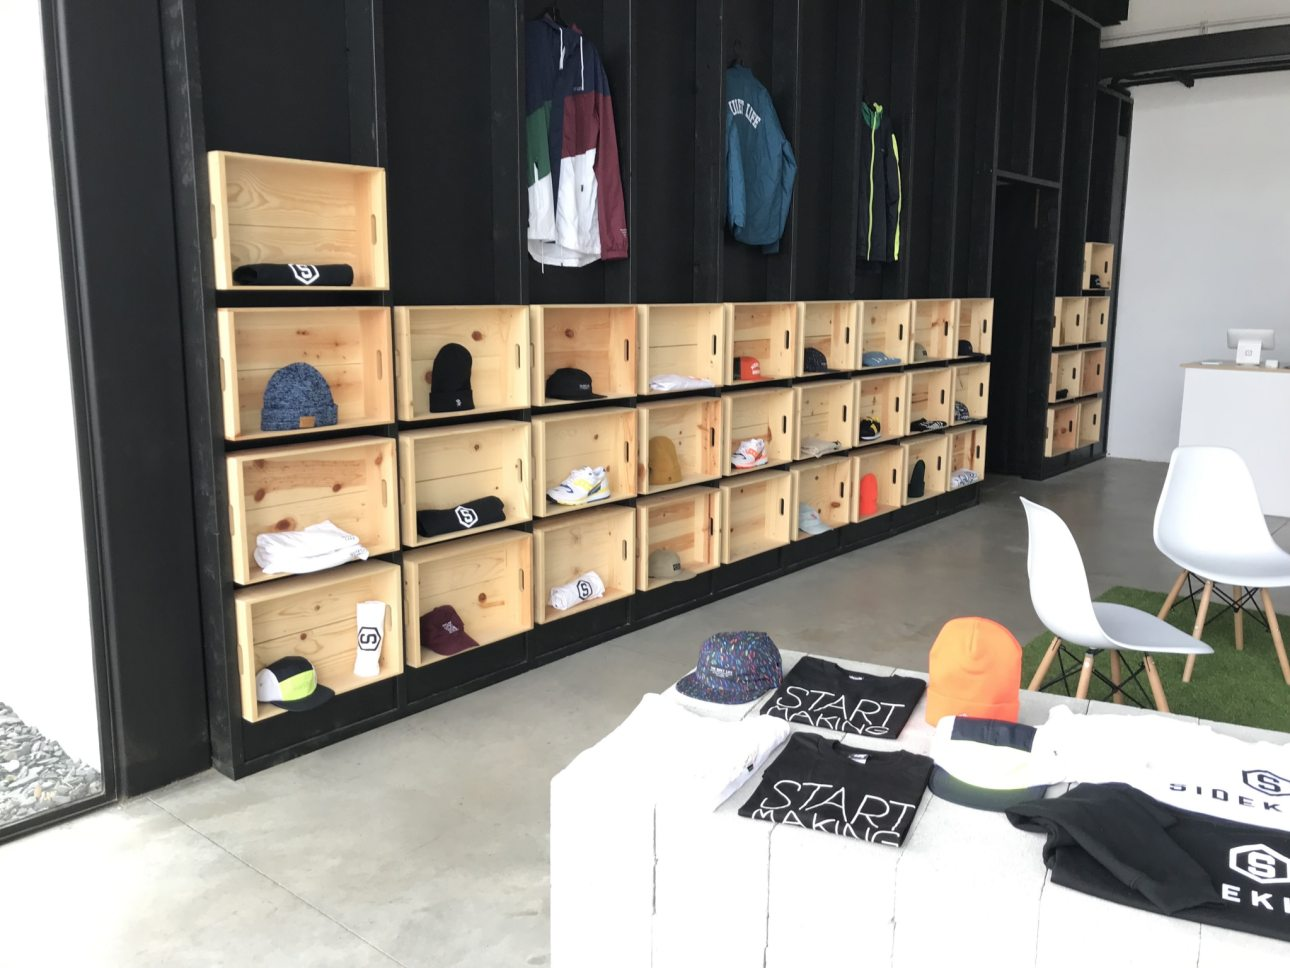 Birmingham, Alabama, Avondale, Sidekicks, Sneaker Shop, 400 41st St S